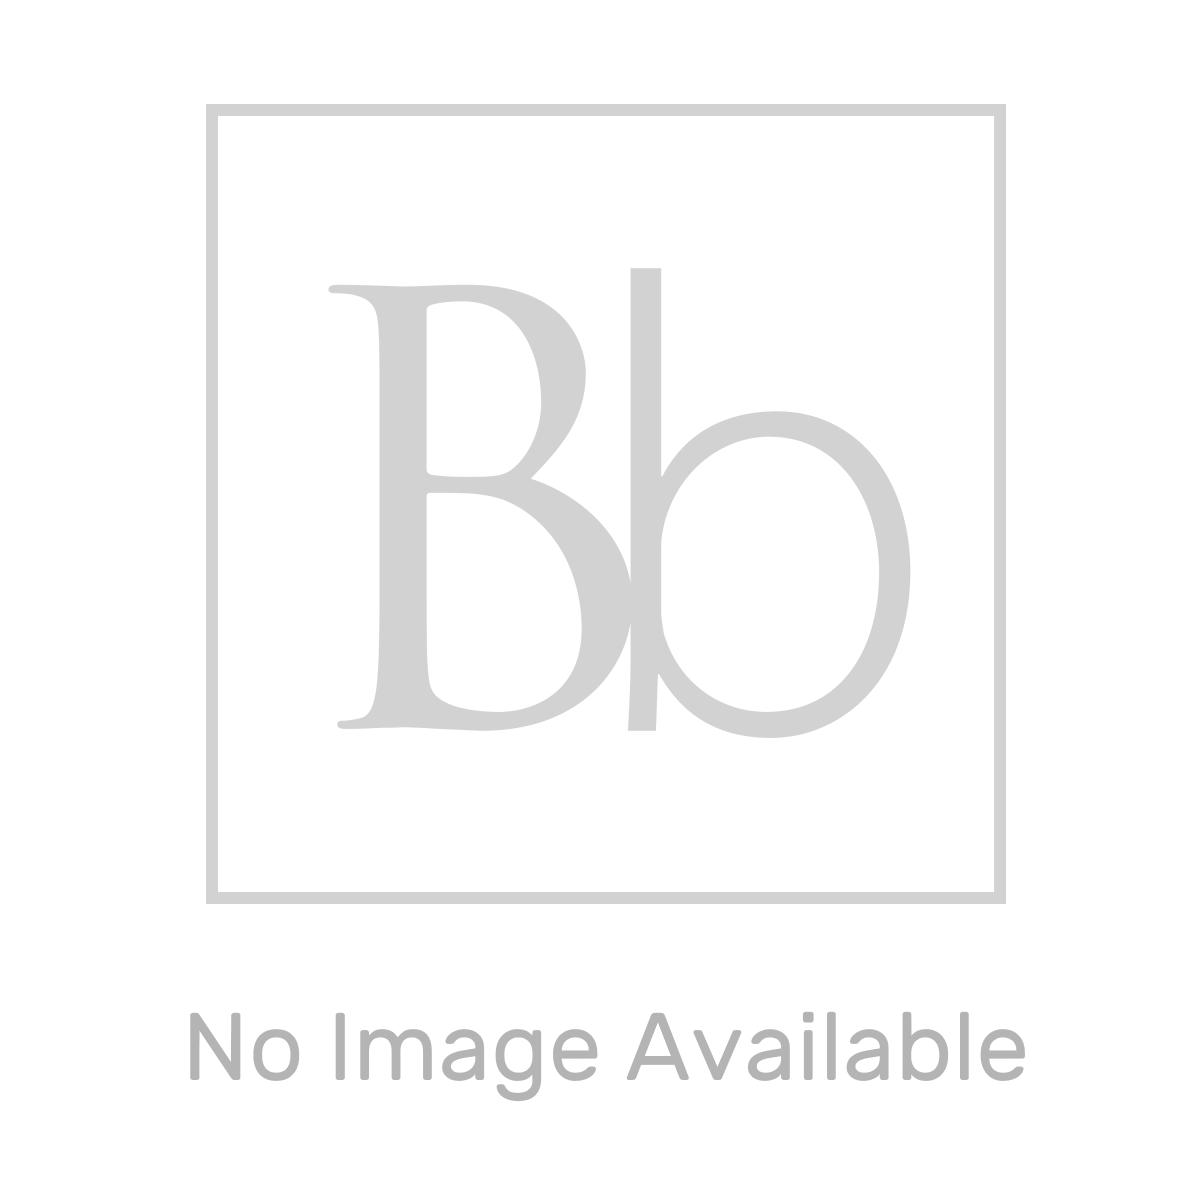 Kartell Purity White 2 Drawer Floor Standing Vanity Unit 600mm Drawing